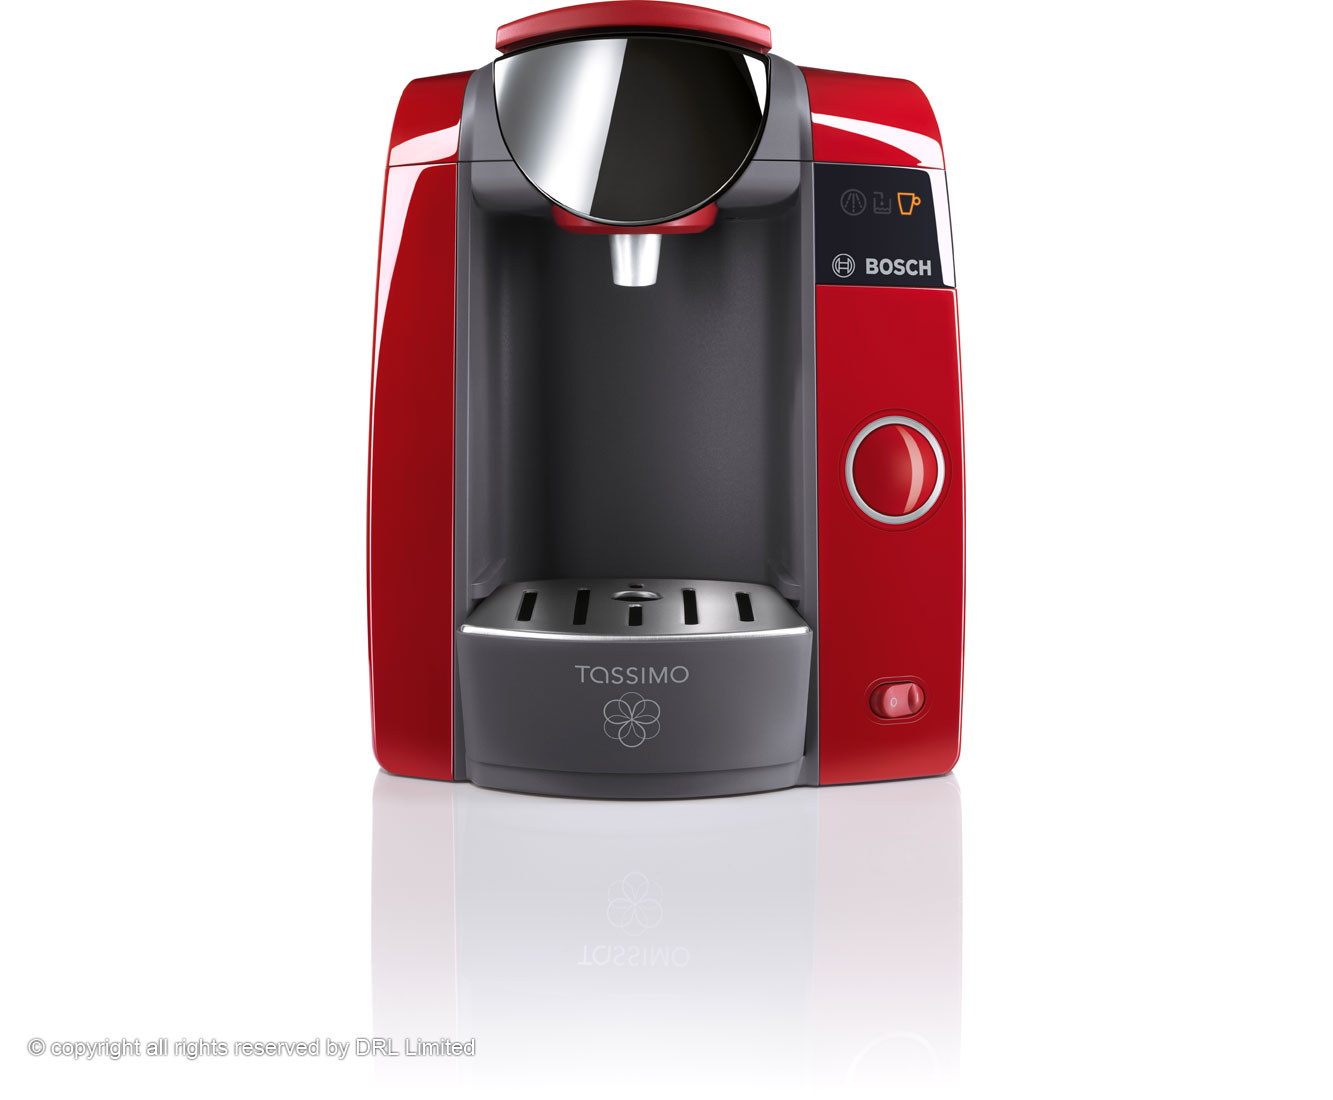 bosch tassimo joy t43 red multi drinks pod machine. Black Bedroom Furniture Sets. Home Design Ideas